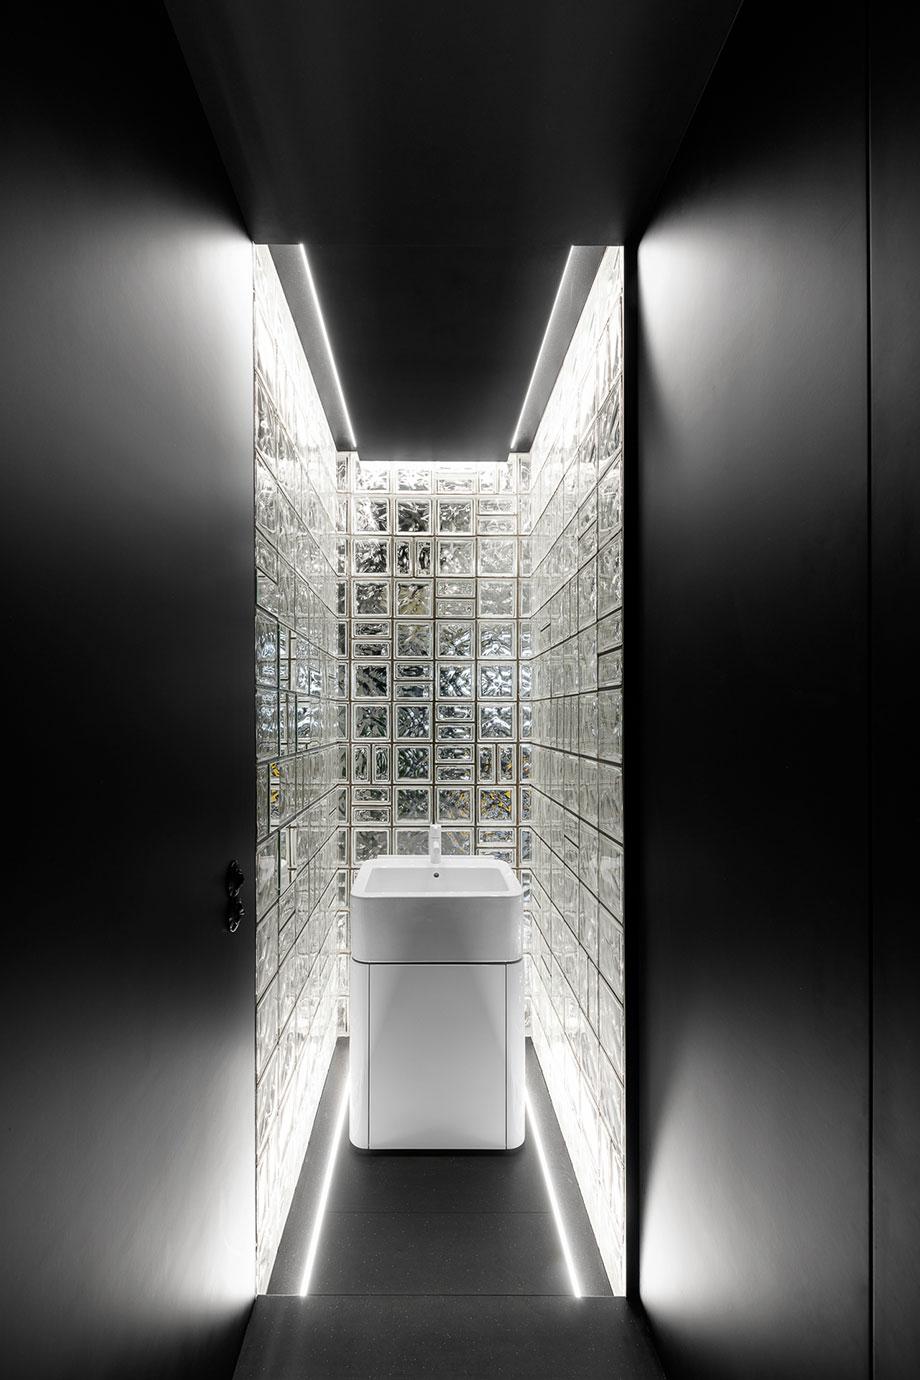 atelier das artes 16 de mmvarquitectos (13) - foto ricardo oliveira alves